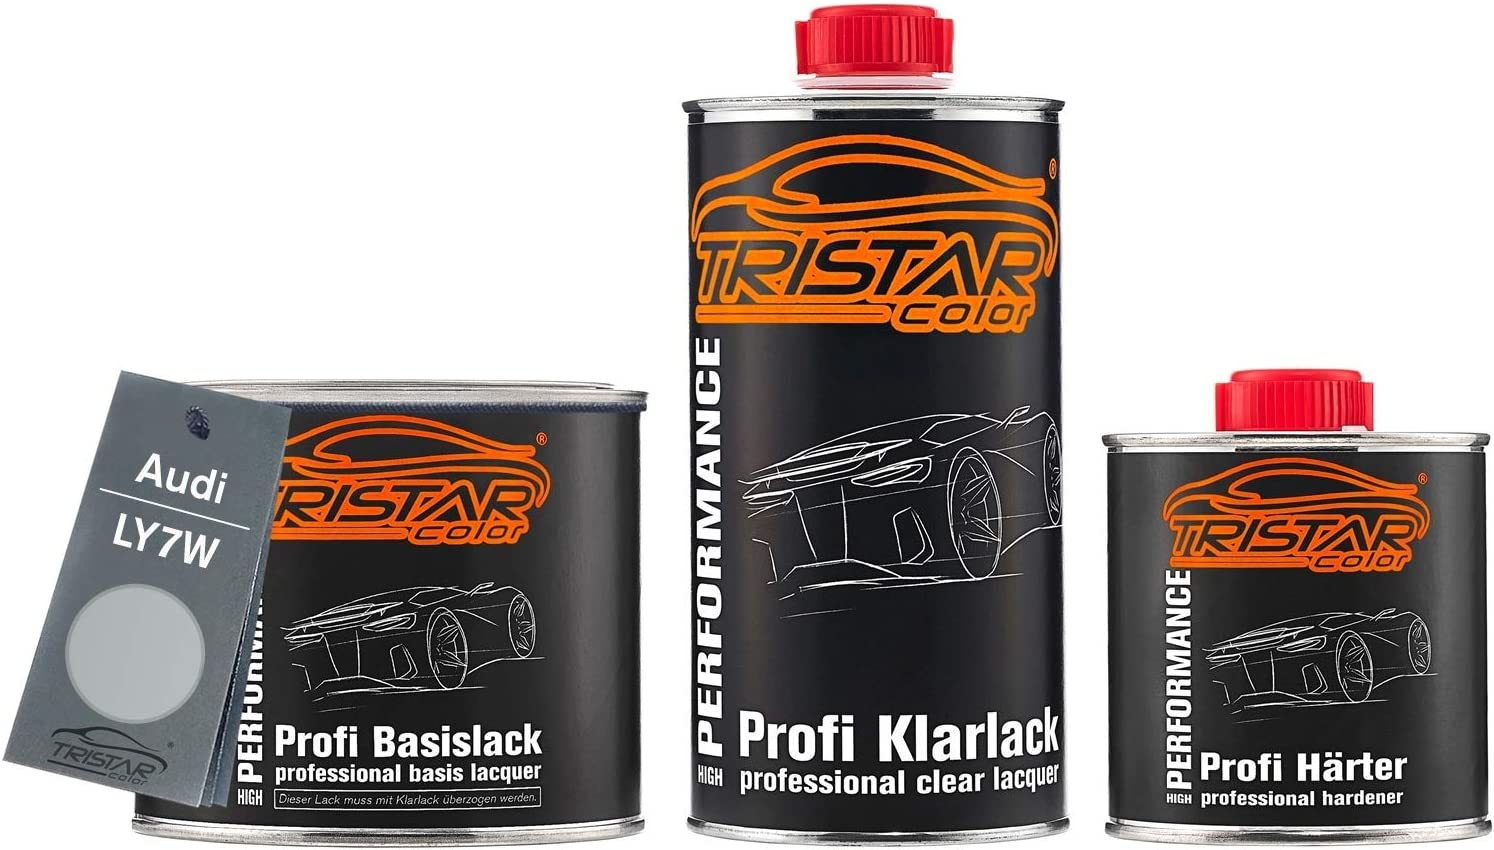 Tristarcolor Autolack Set Dose Spritzfertig Für Audi Ly7w Silbersee Metallic Argent Metallic Basislack 2k Klarlack 1 25l Auto